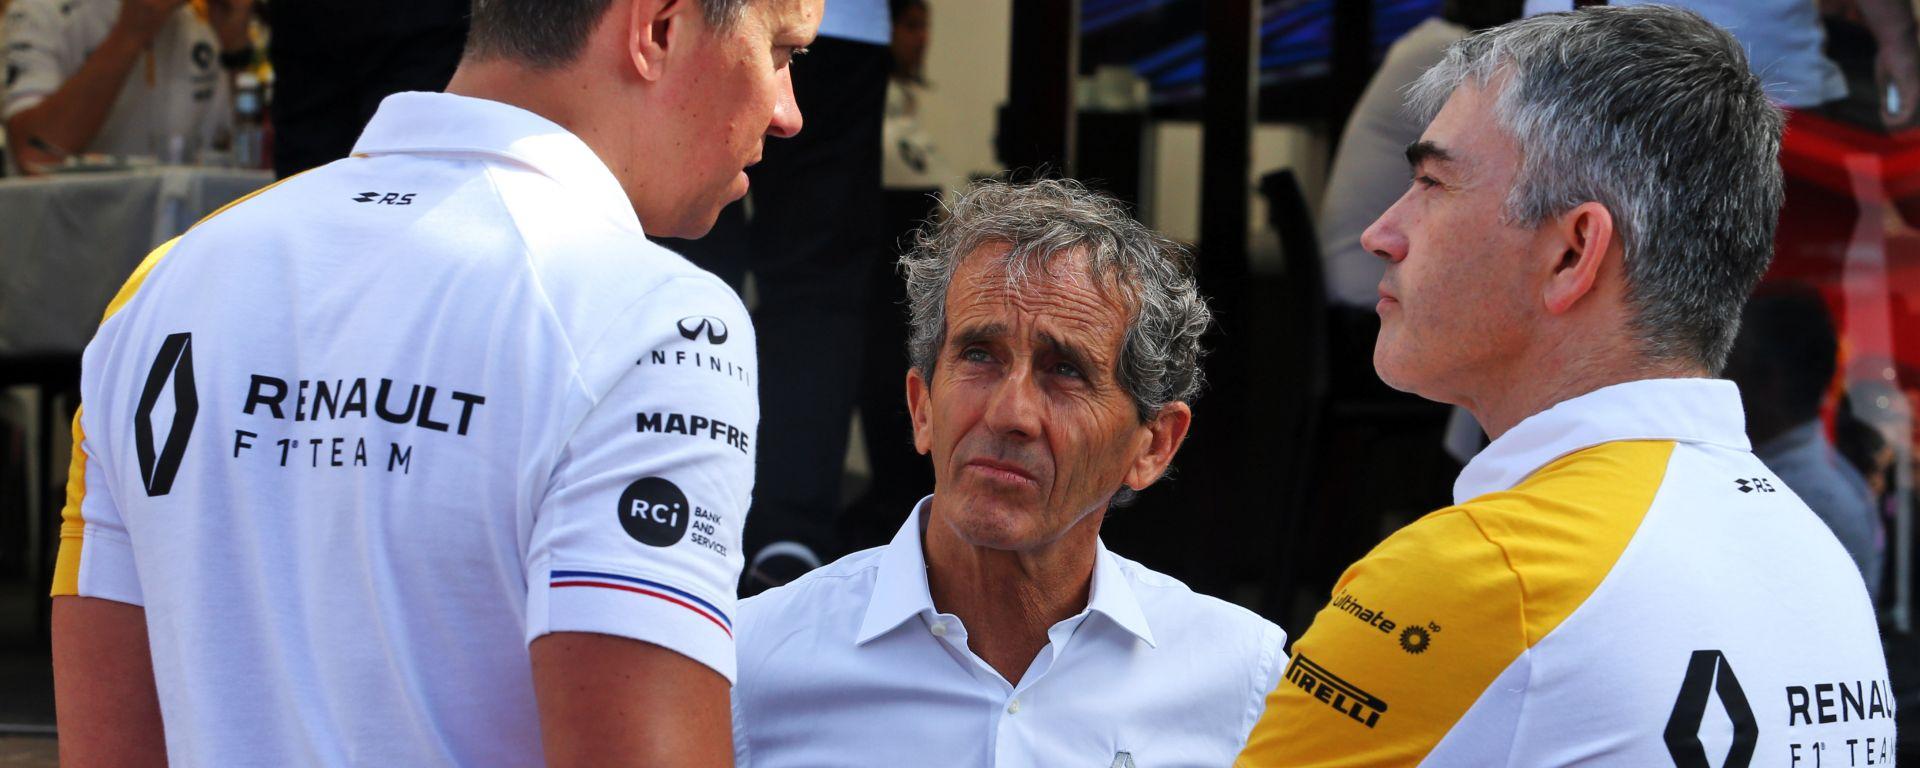 F1: Alain Prost con Marcin Budkowski e Nick Chester (Renault)